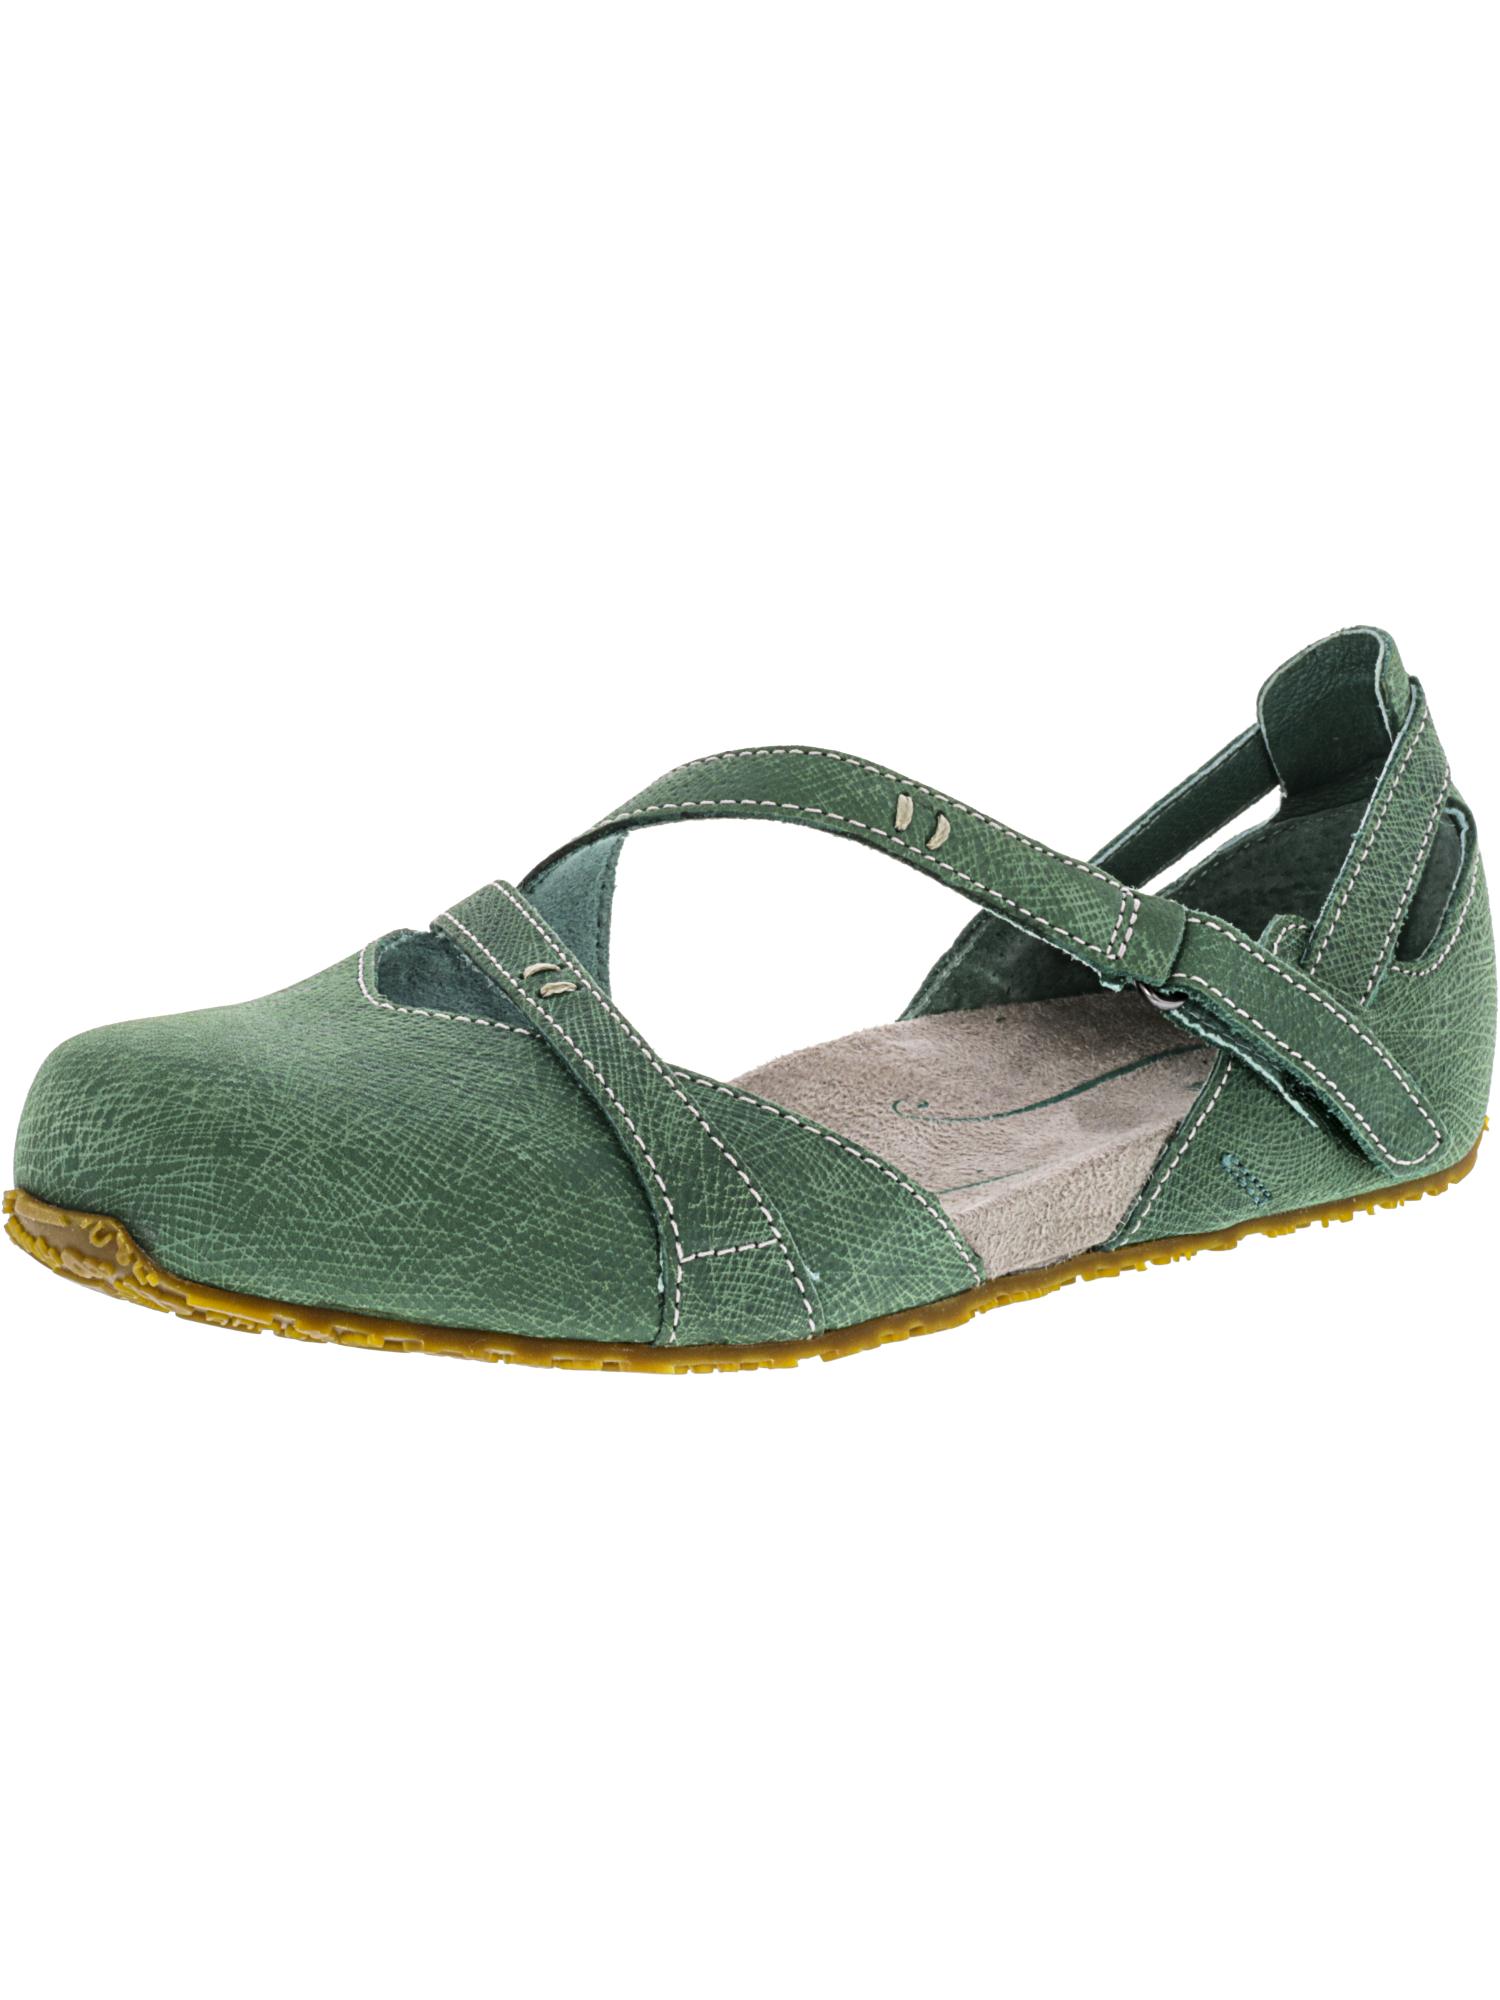 Ahnu Women's Flat Tullia Ankle-High Leather Ballet Flat Women's 53c2c5